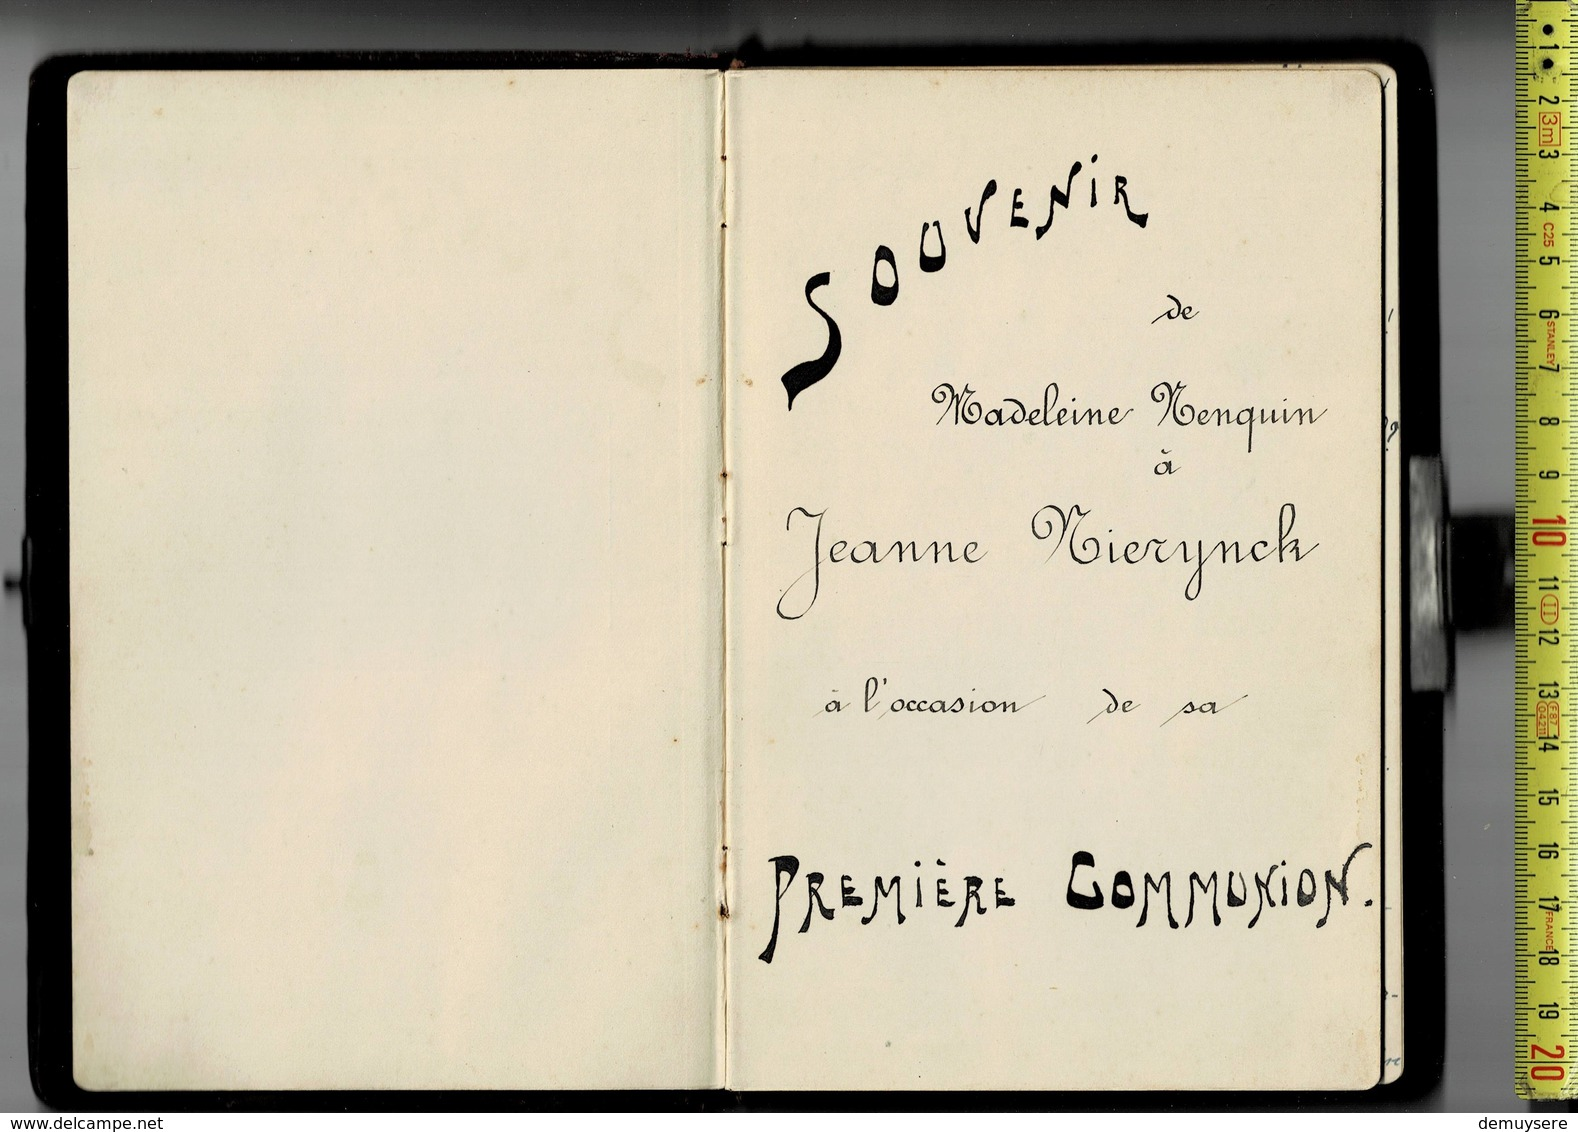 20107 - LIVRE 2 - SOUVENIR DE MADELEINE NENQUIN 1923 - Culture